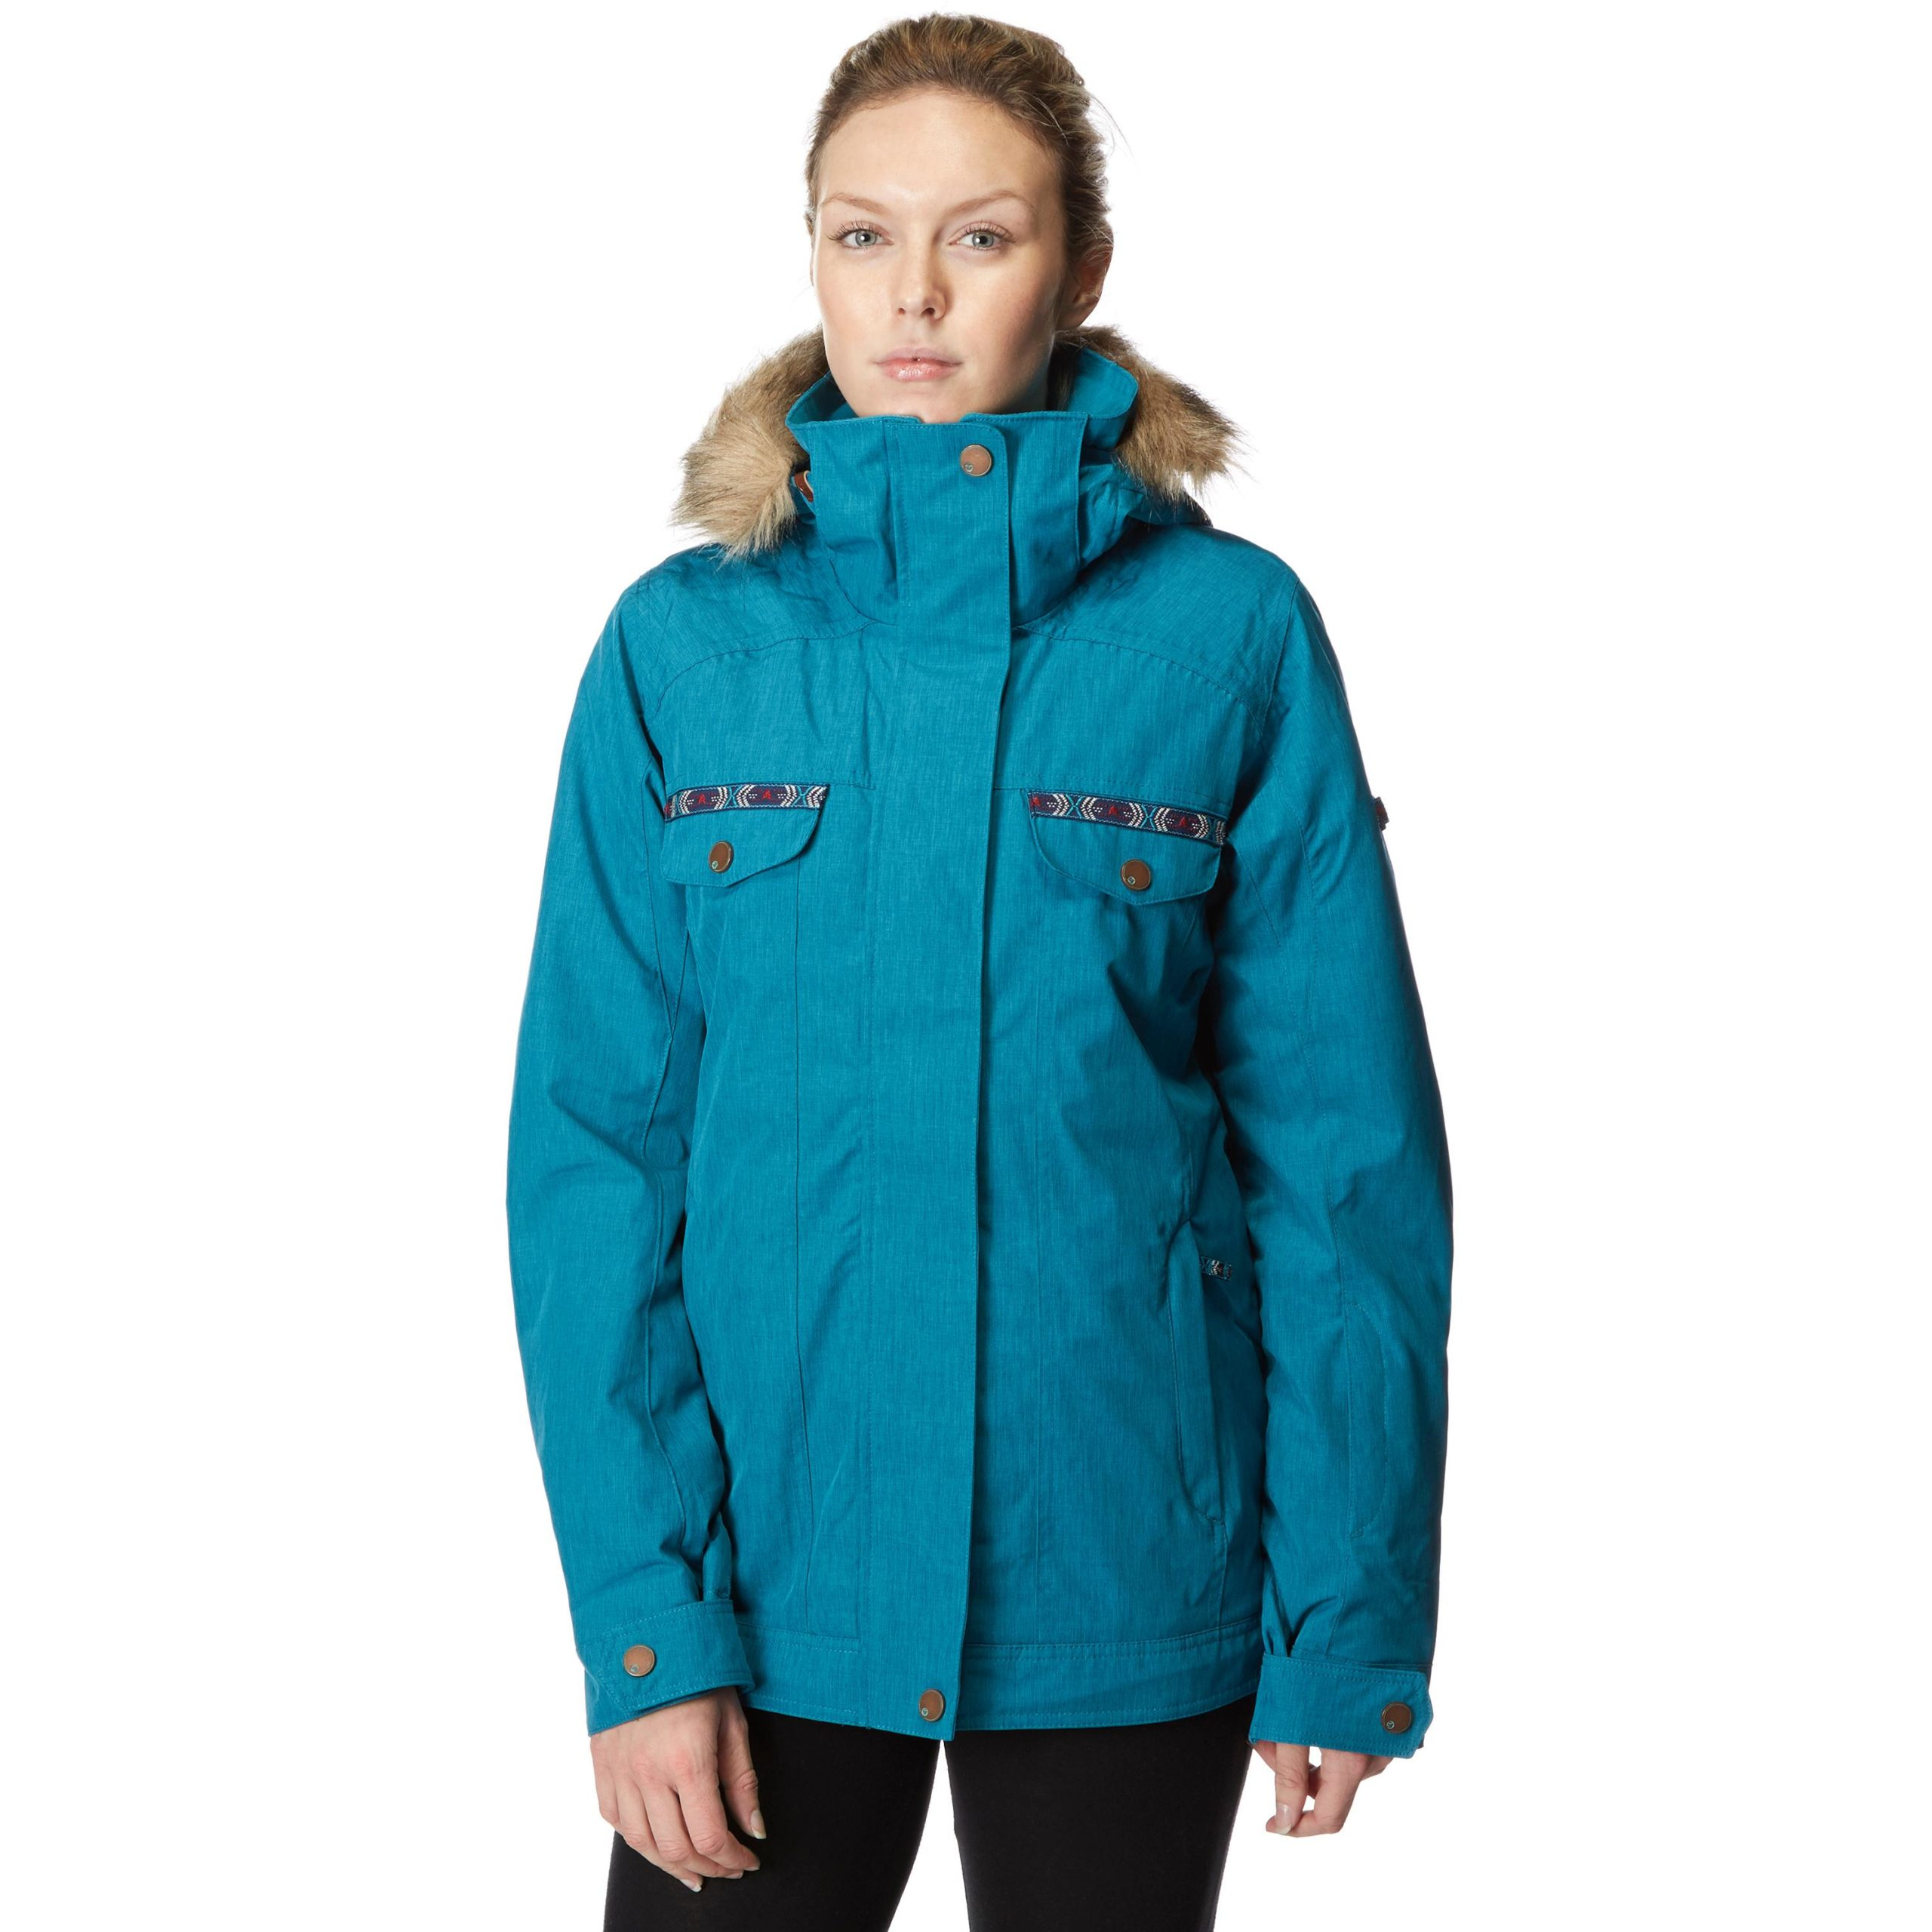 Roxy Women's Misti Snowboard Jacket